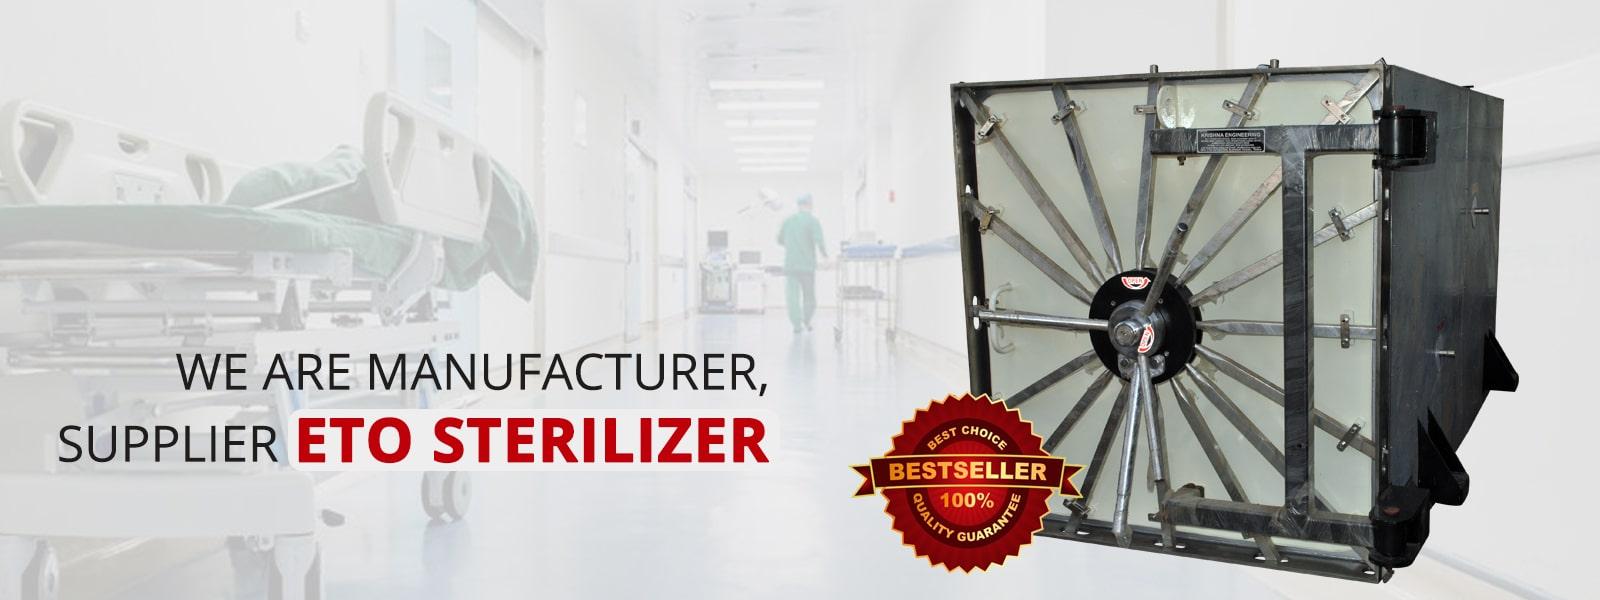 ETO Sterilizer Manufacturer, Gujarat, Exporter in Ahmedabad, Gujarat, India